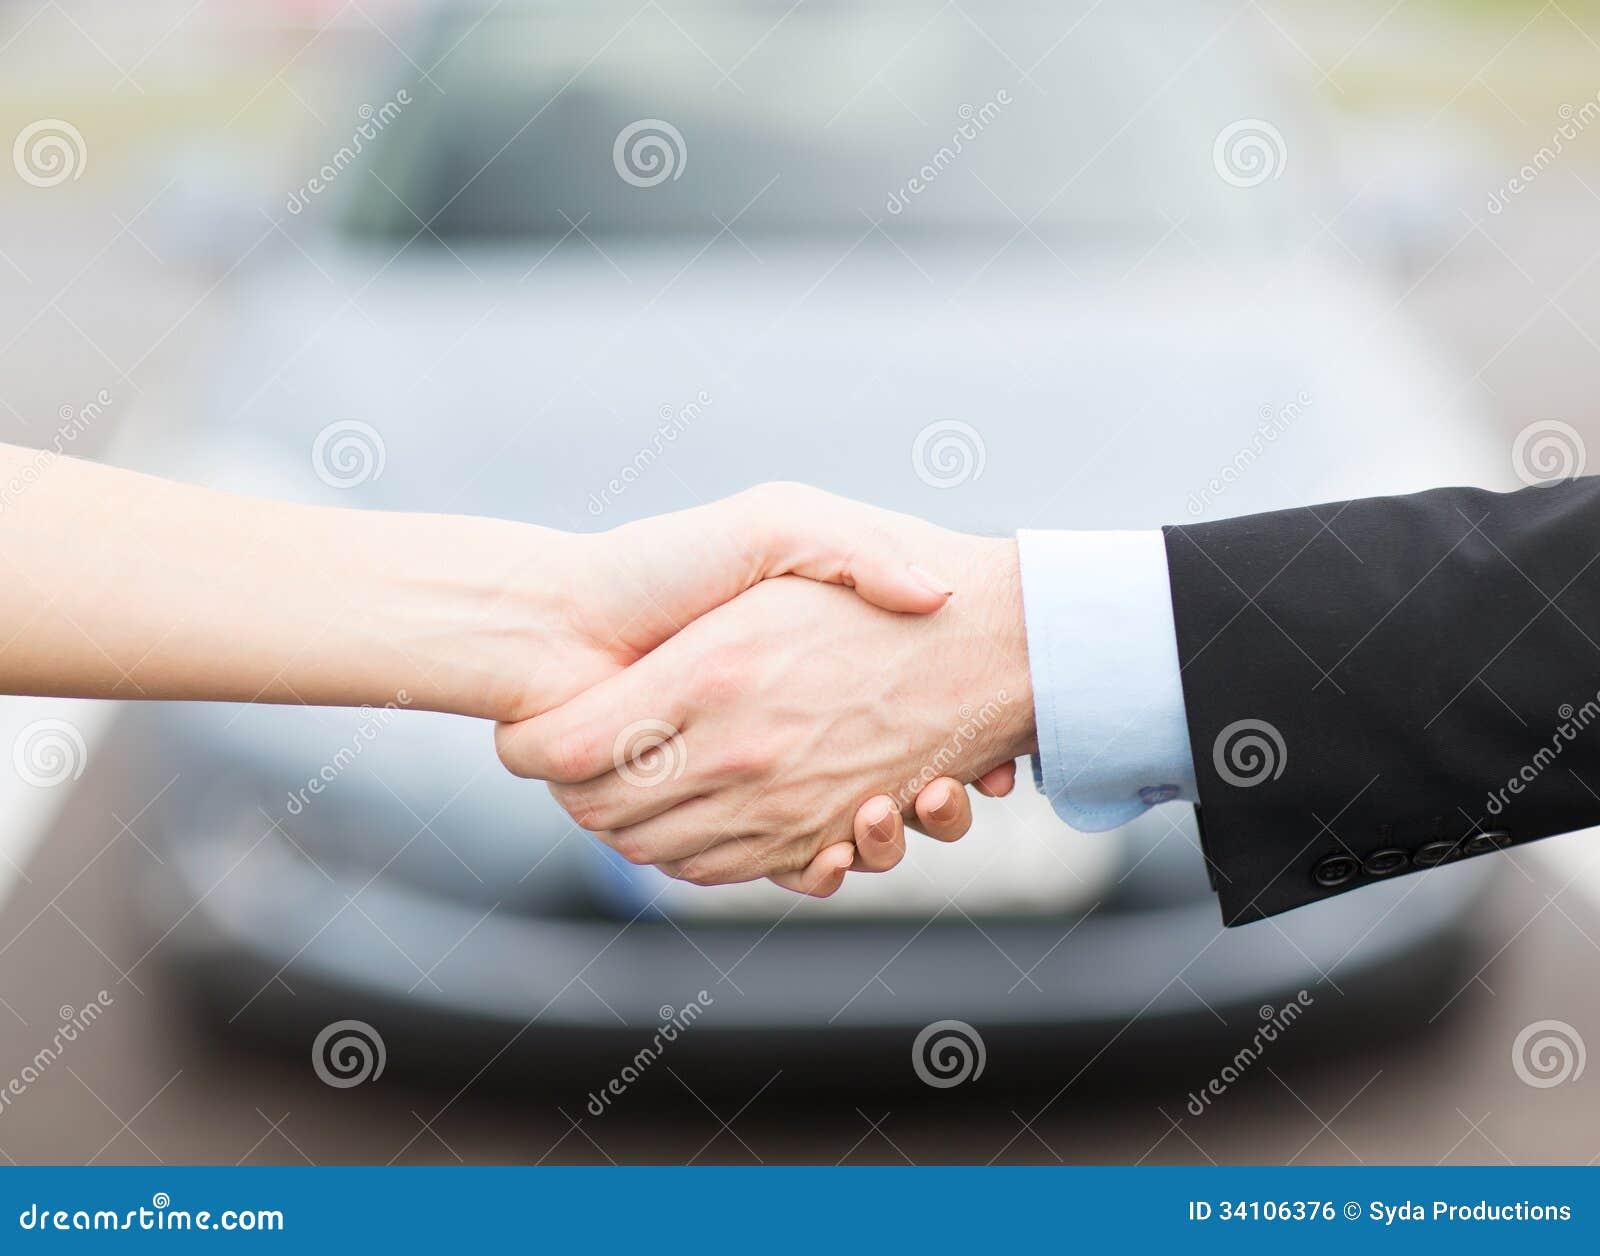 customer and salesman shaking hands royalty free stock image